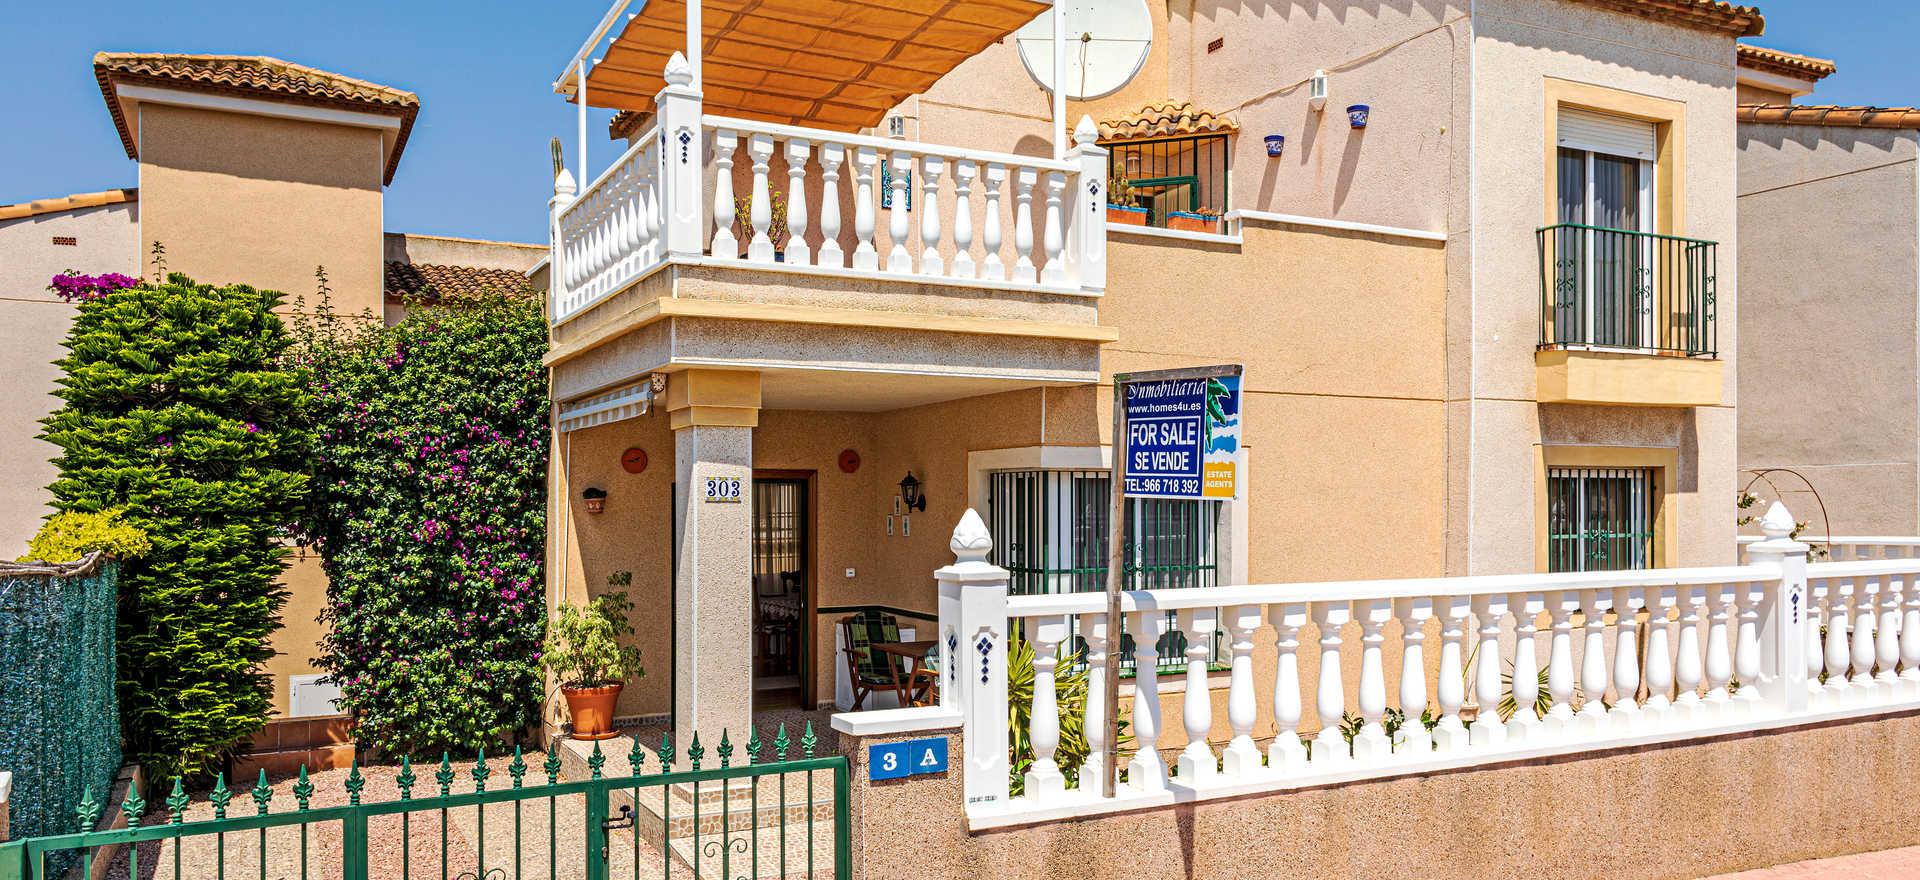 Property For Sale In Montebello